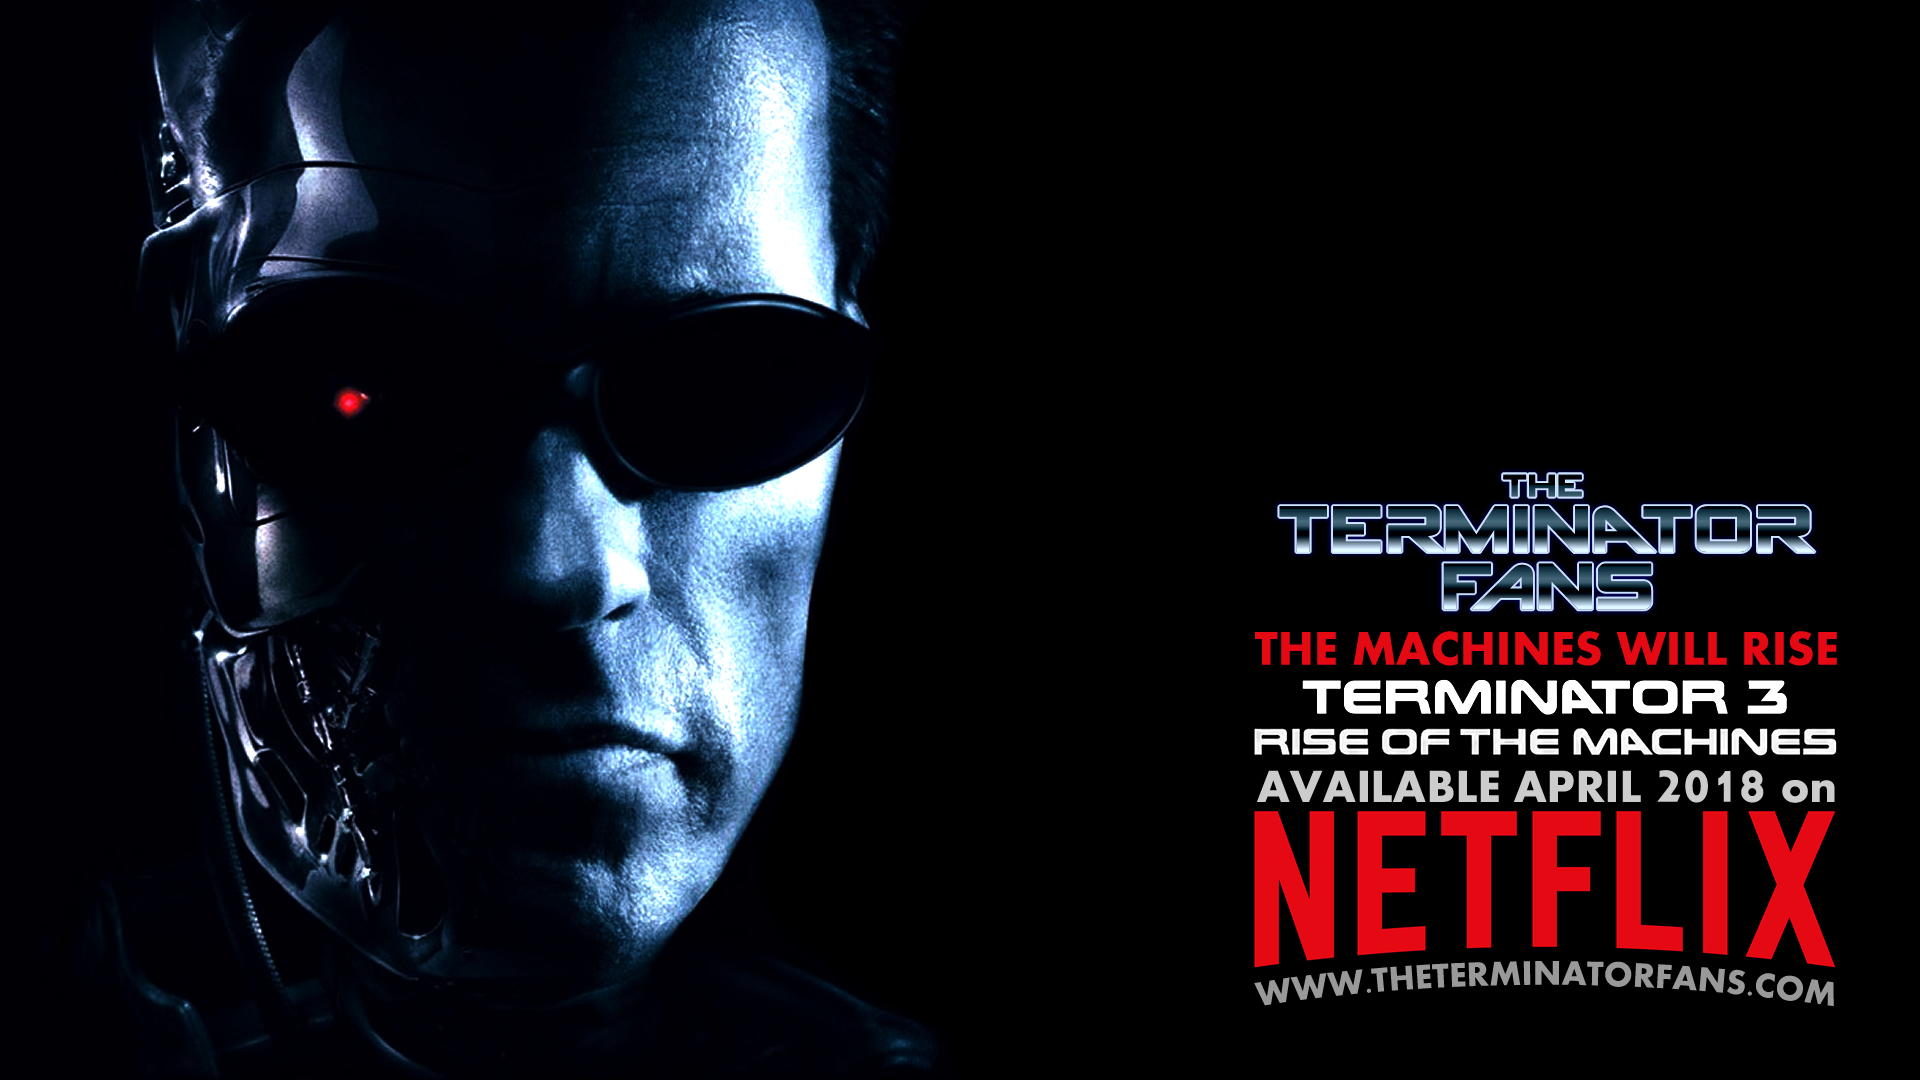 Terminator 3: Rise of the Machines NETFLIX